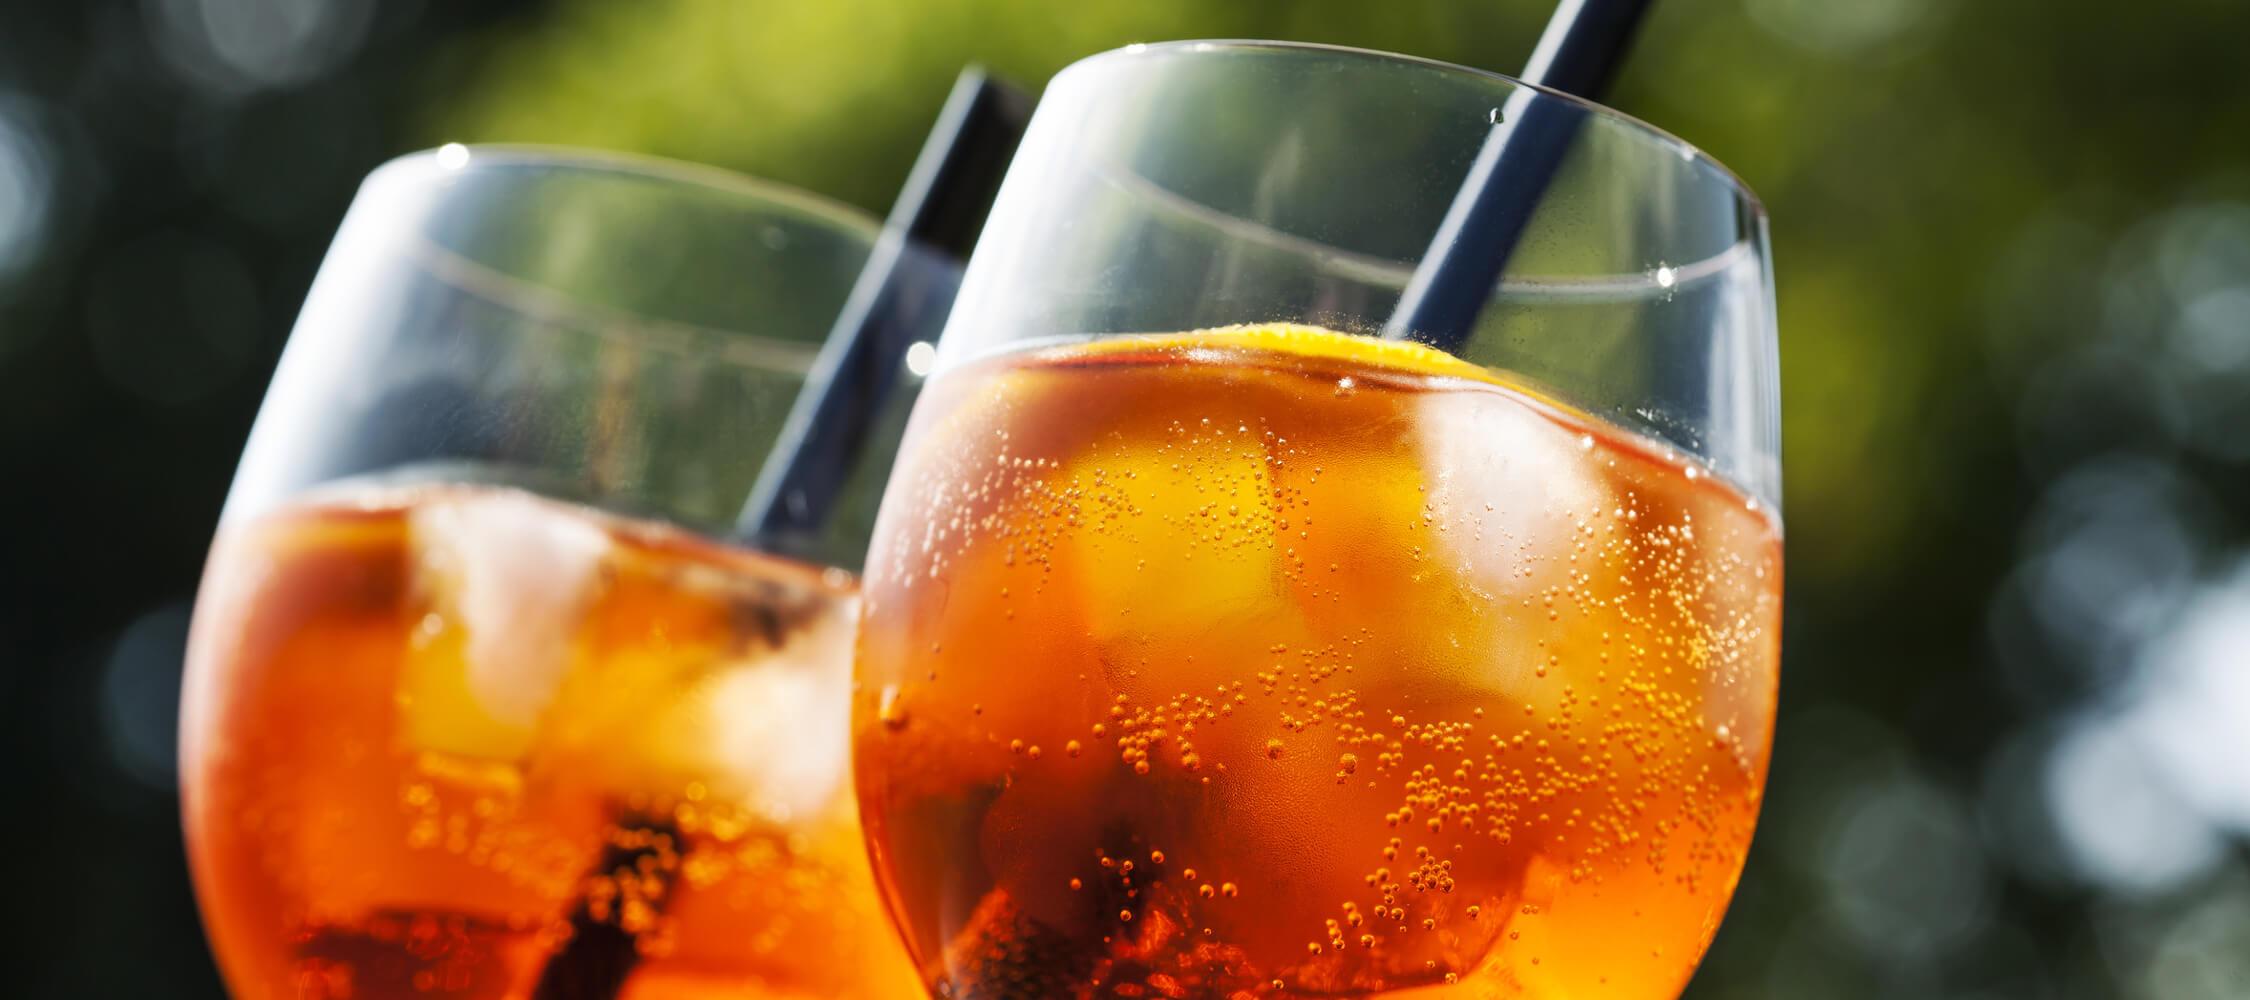 Hotel_Flora_Meran_Bar_Garten_Terrassel_Drink_Aperitif_Cocktail_163182734_2250x1000